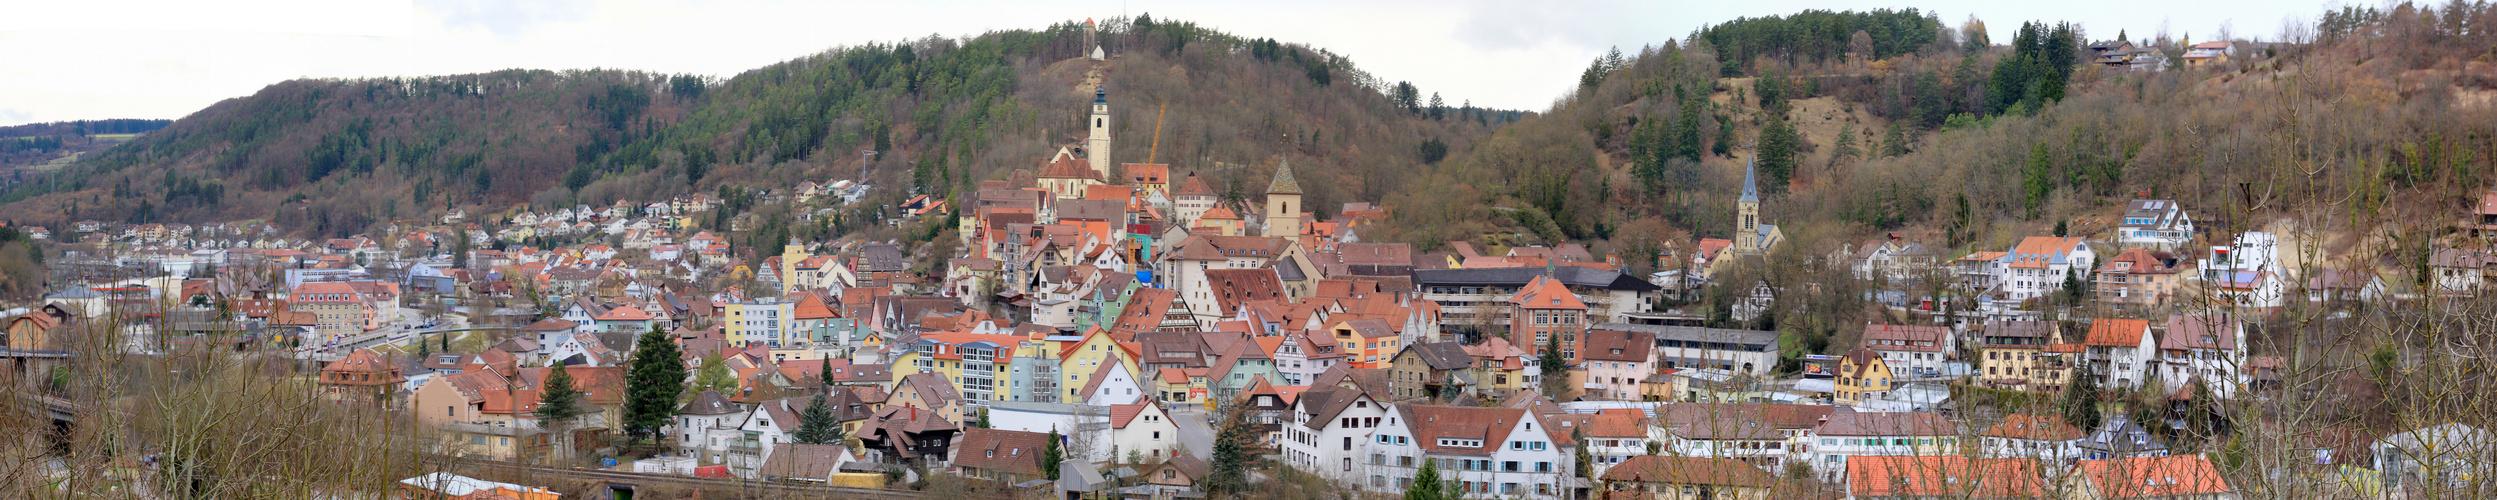 Horb am Neckar - Panorama